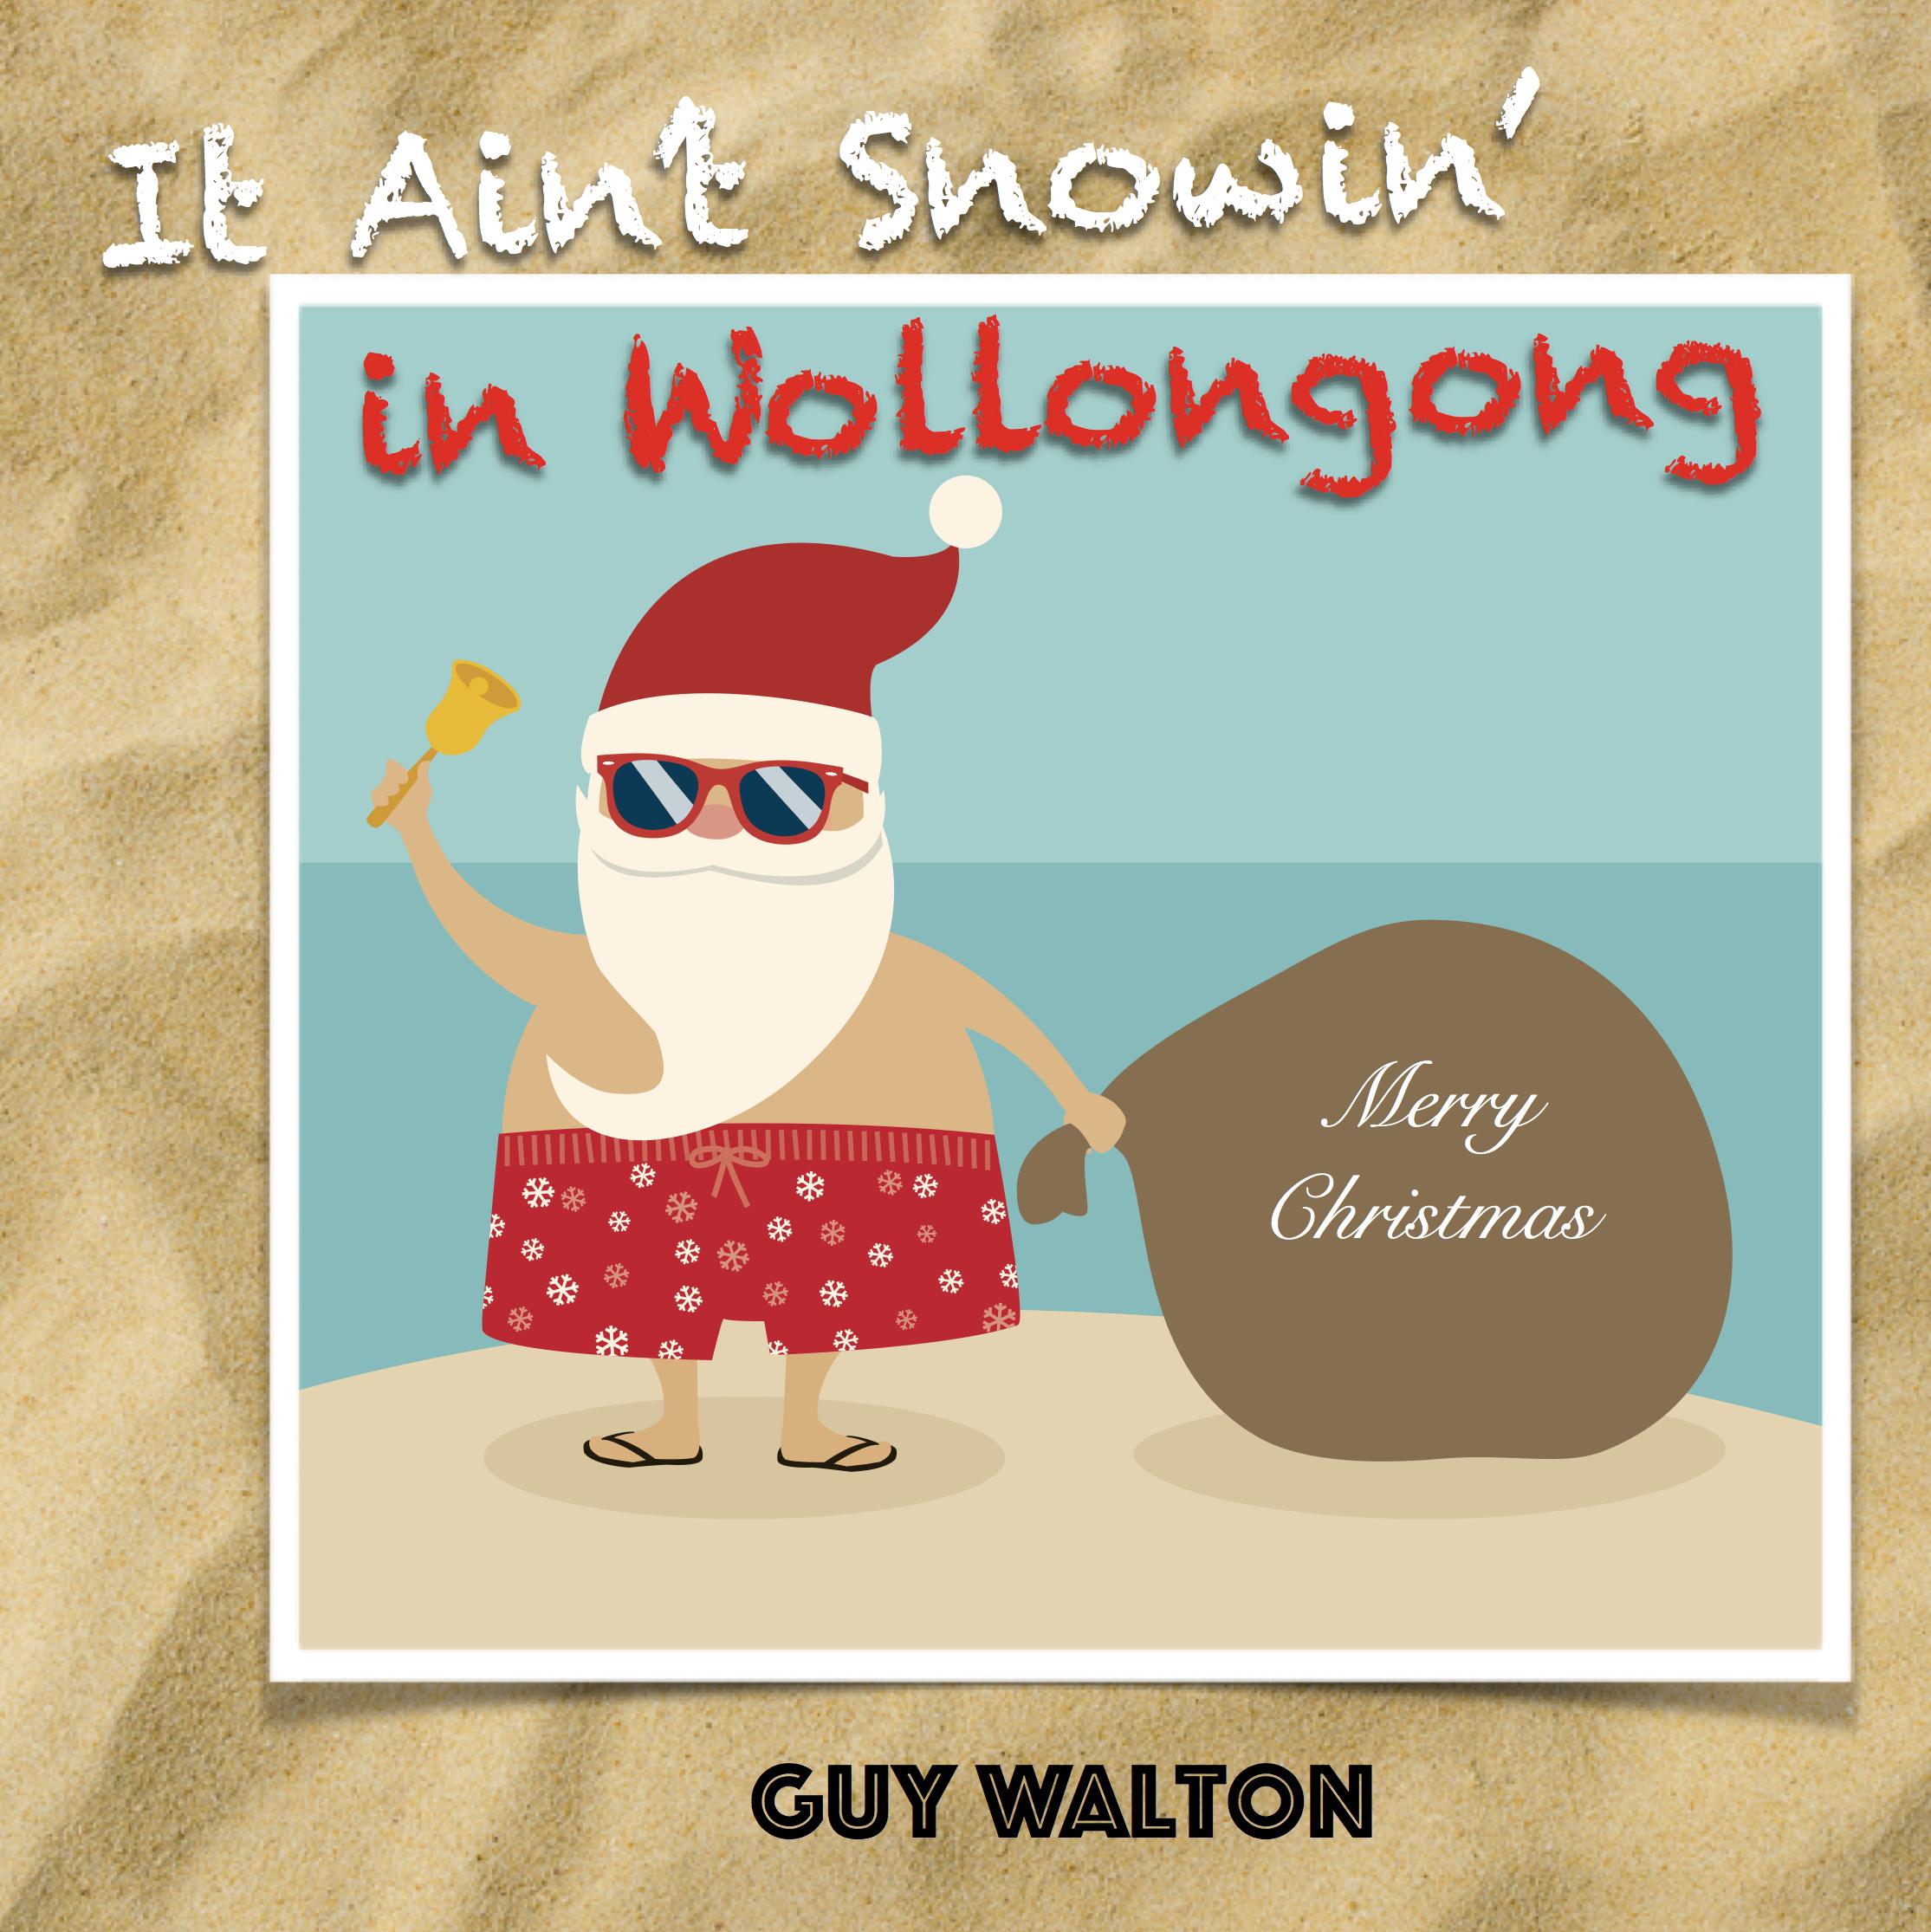 Snowin' in Wollongong